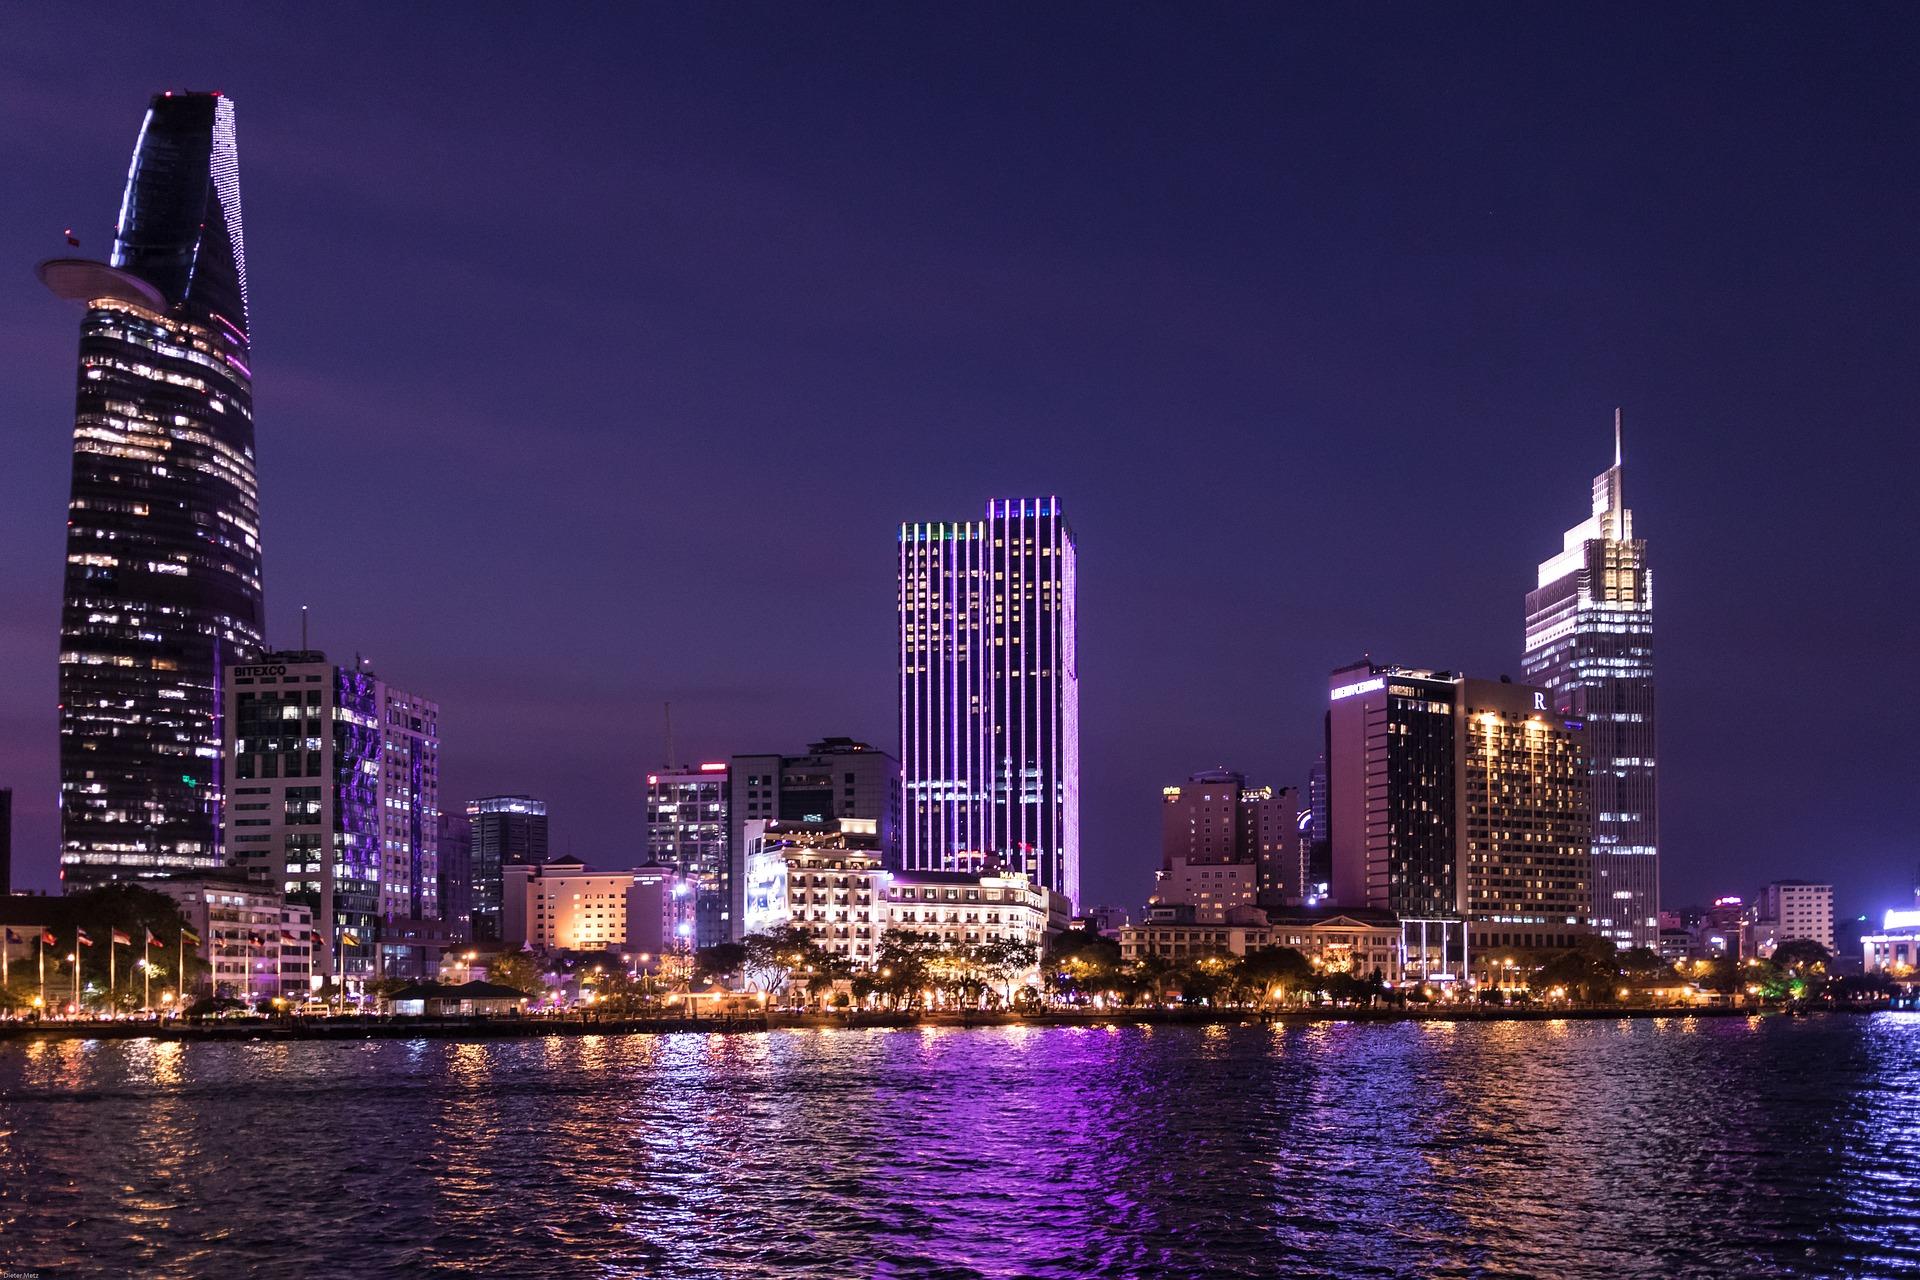 Saigon Nightlife - Ho Chi Minh City Skyline.jpg